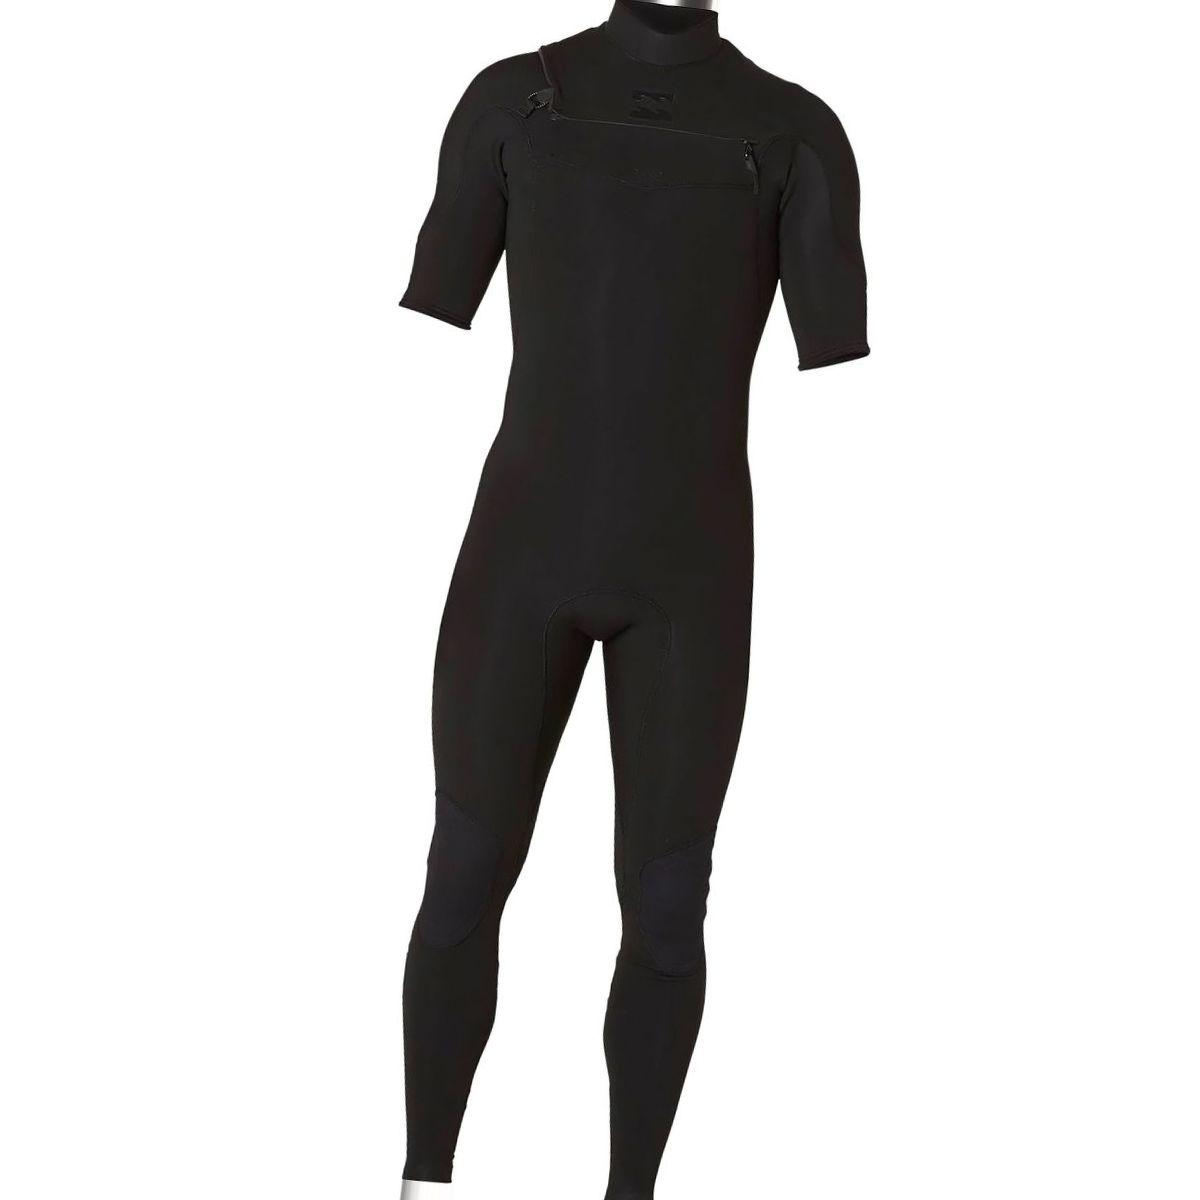 Billabong 2/2 Furnace Carbon Comp Full Wetsuit - Men's